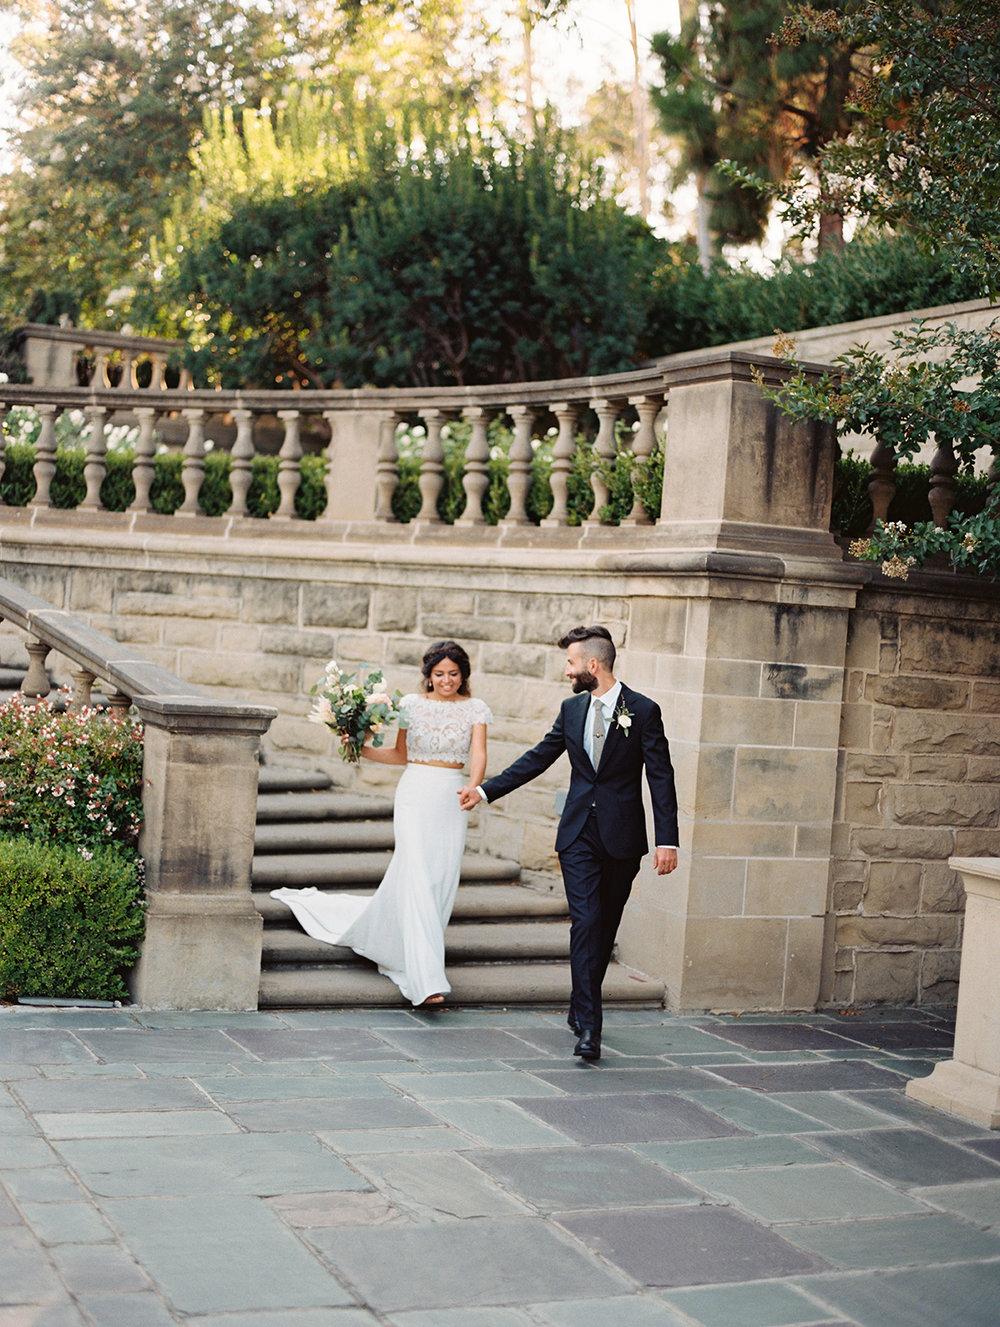 135-brian-sarra-los-angeles-wedding-brumley-wells-photography.jpg